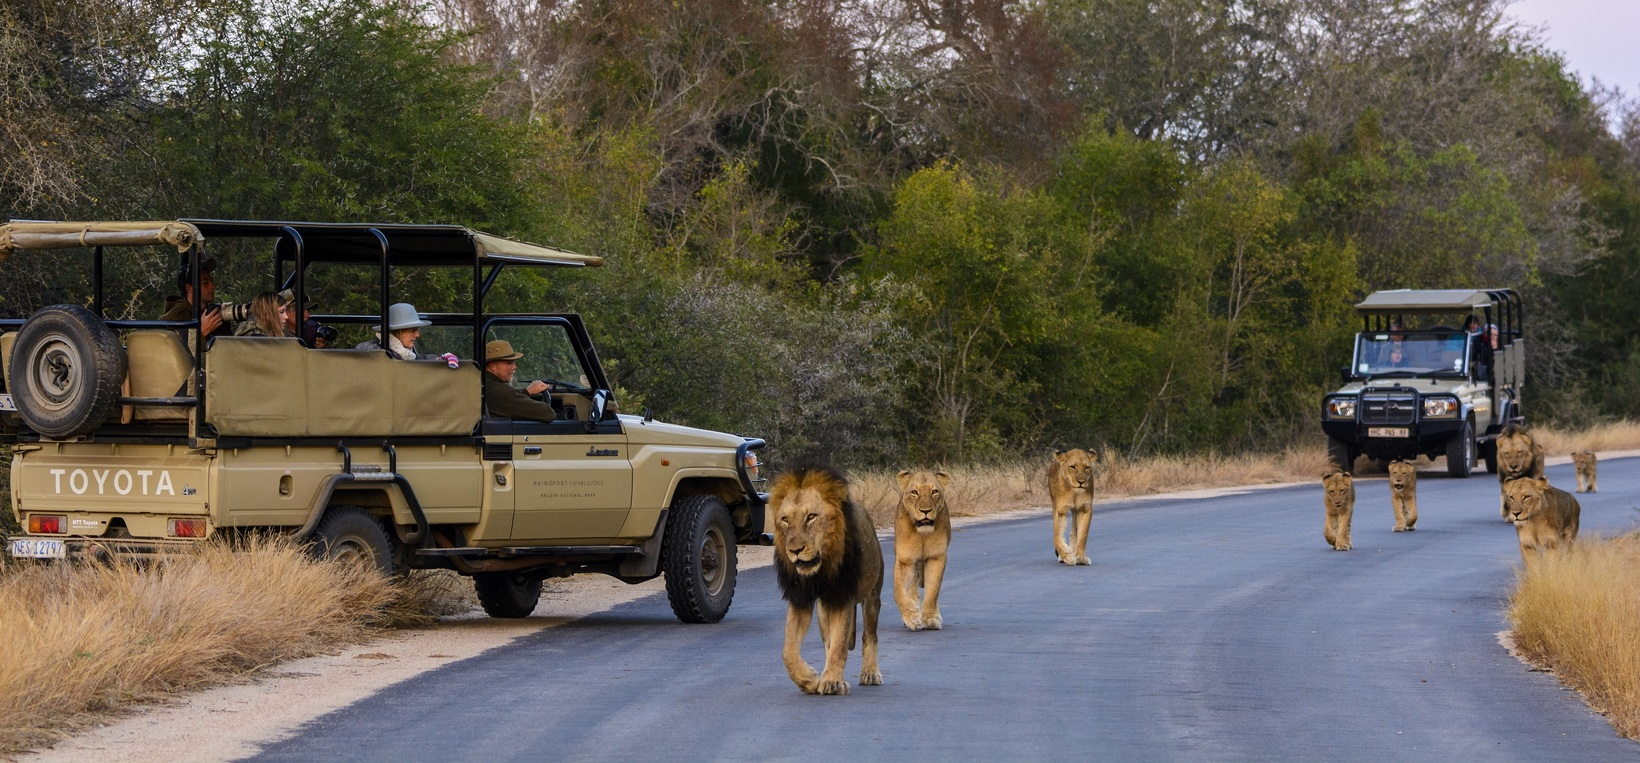 Explore The Infinite Wonders of Africa